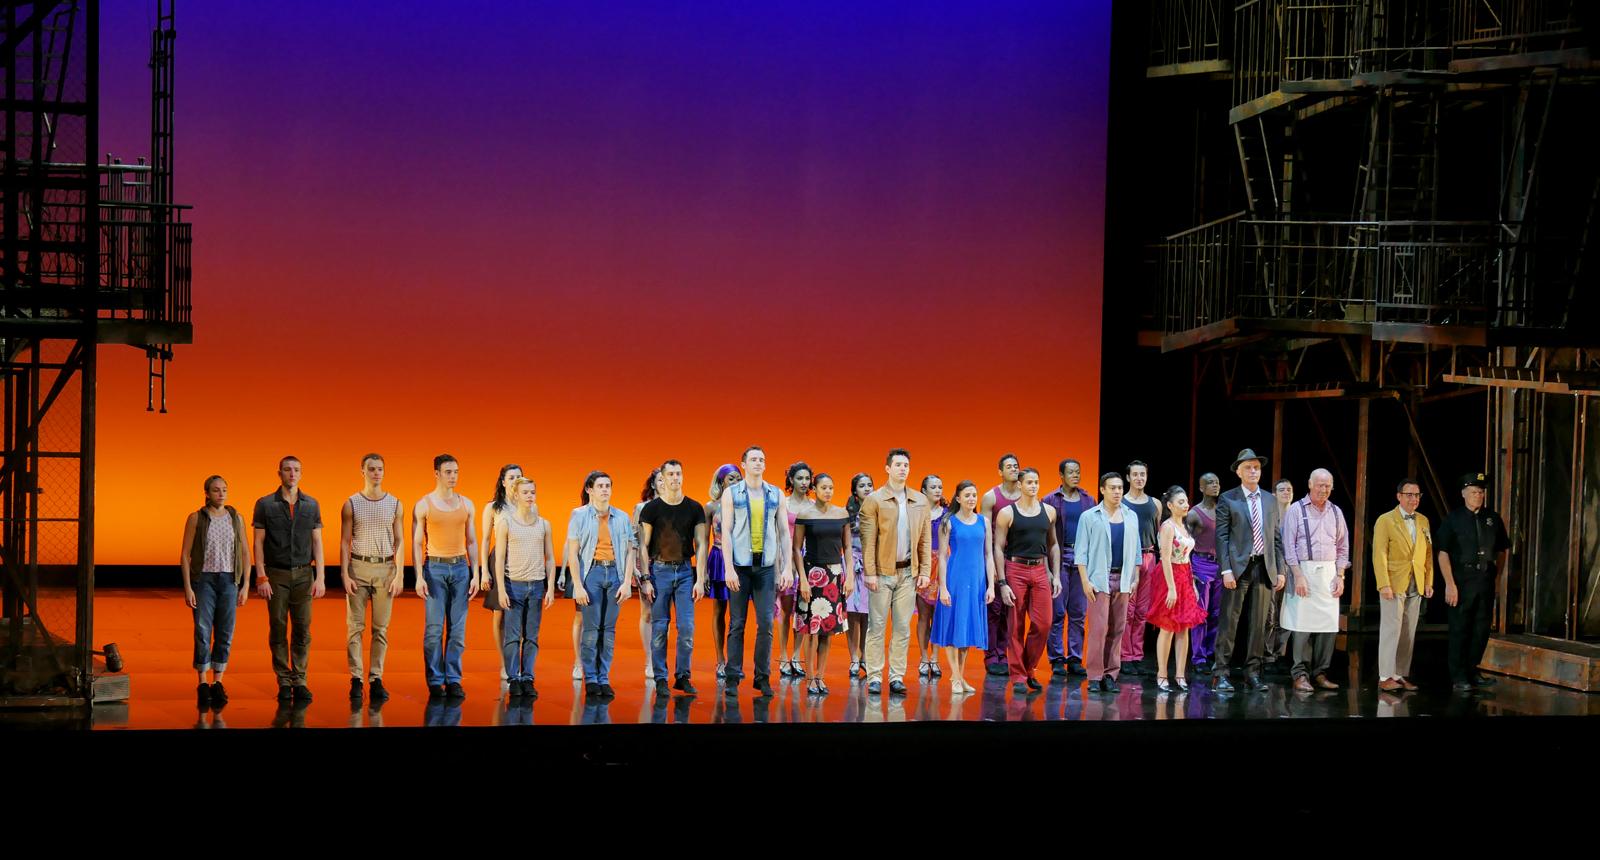 West side story intense beau moderne passionnel - Programme la seine musicale ...